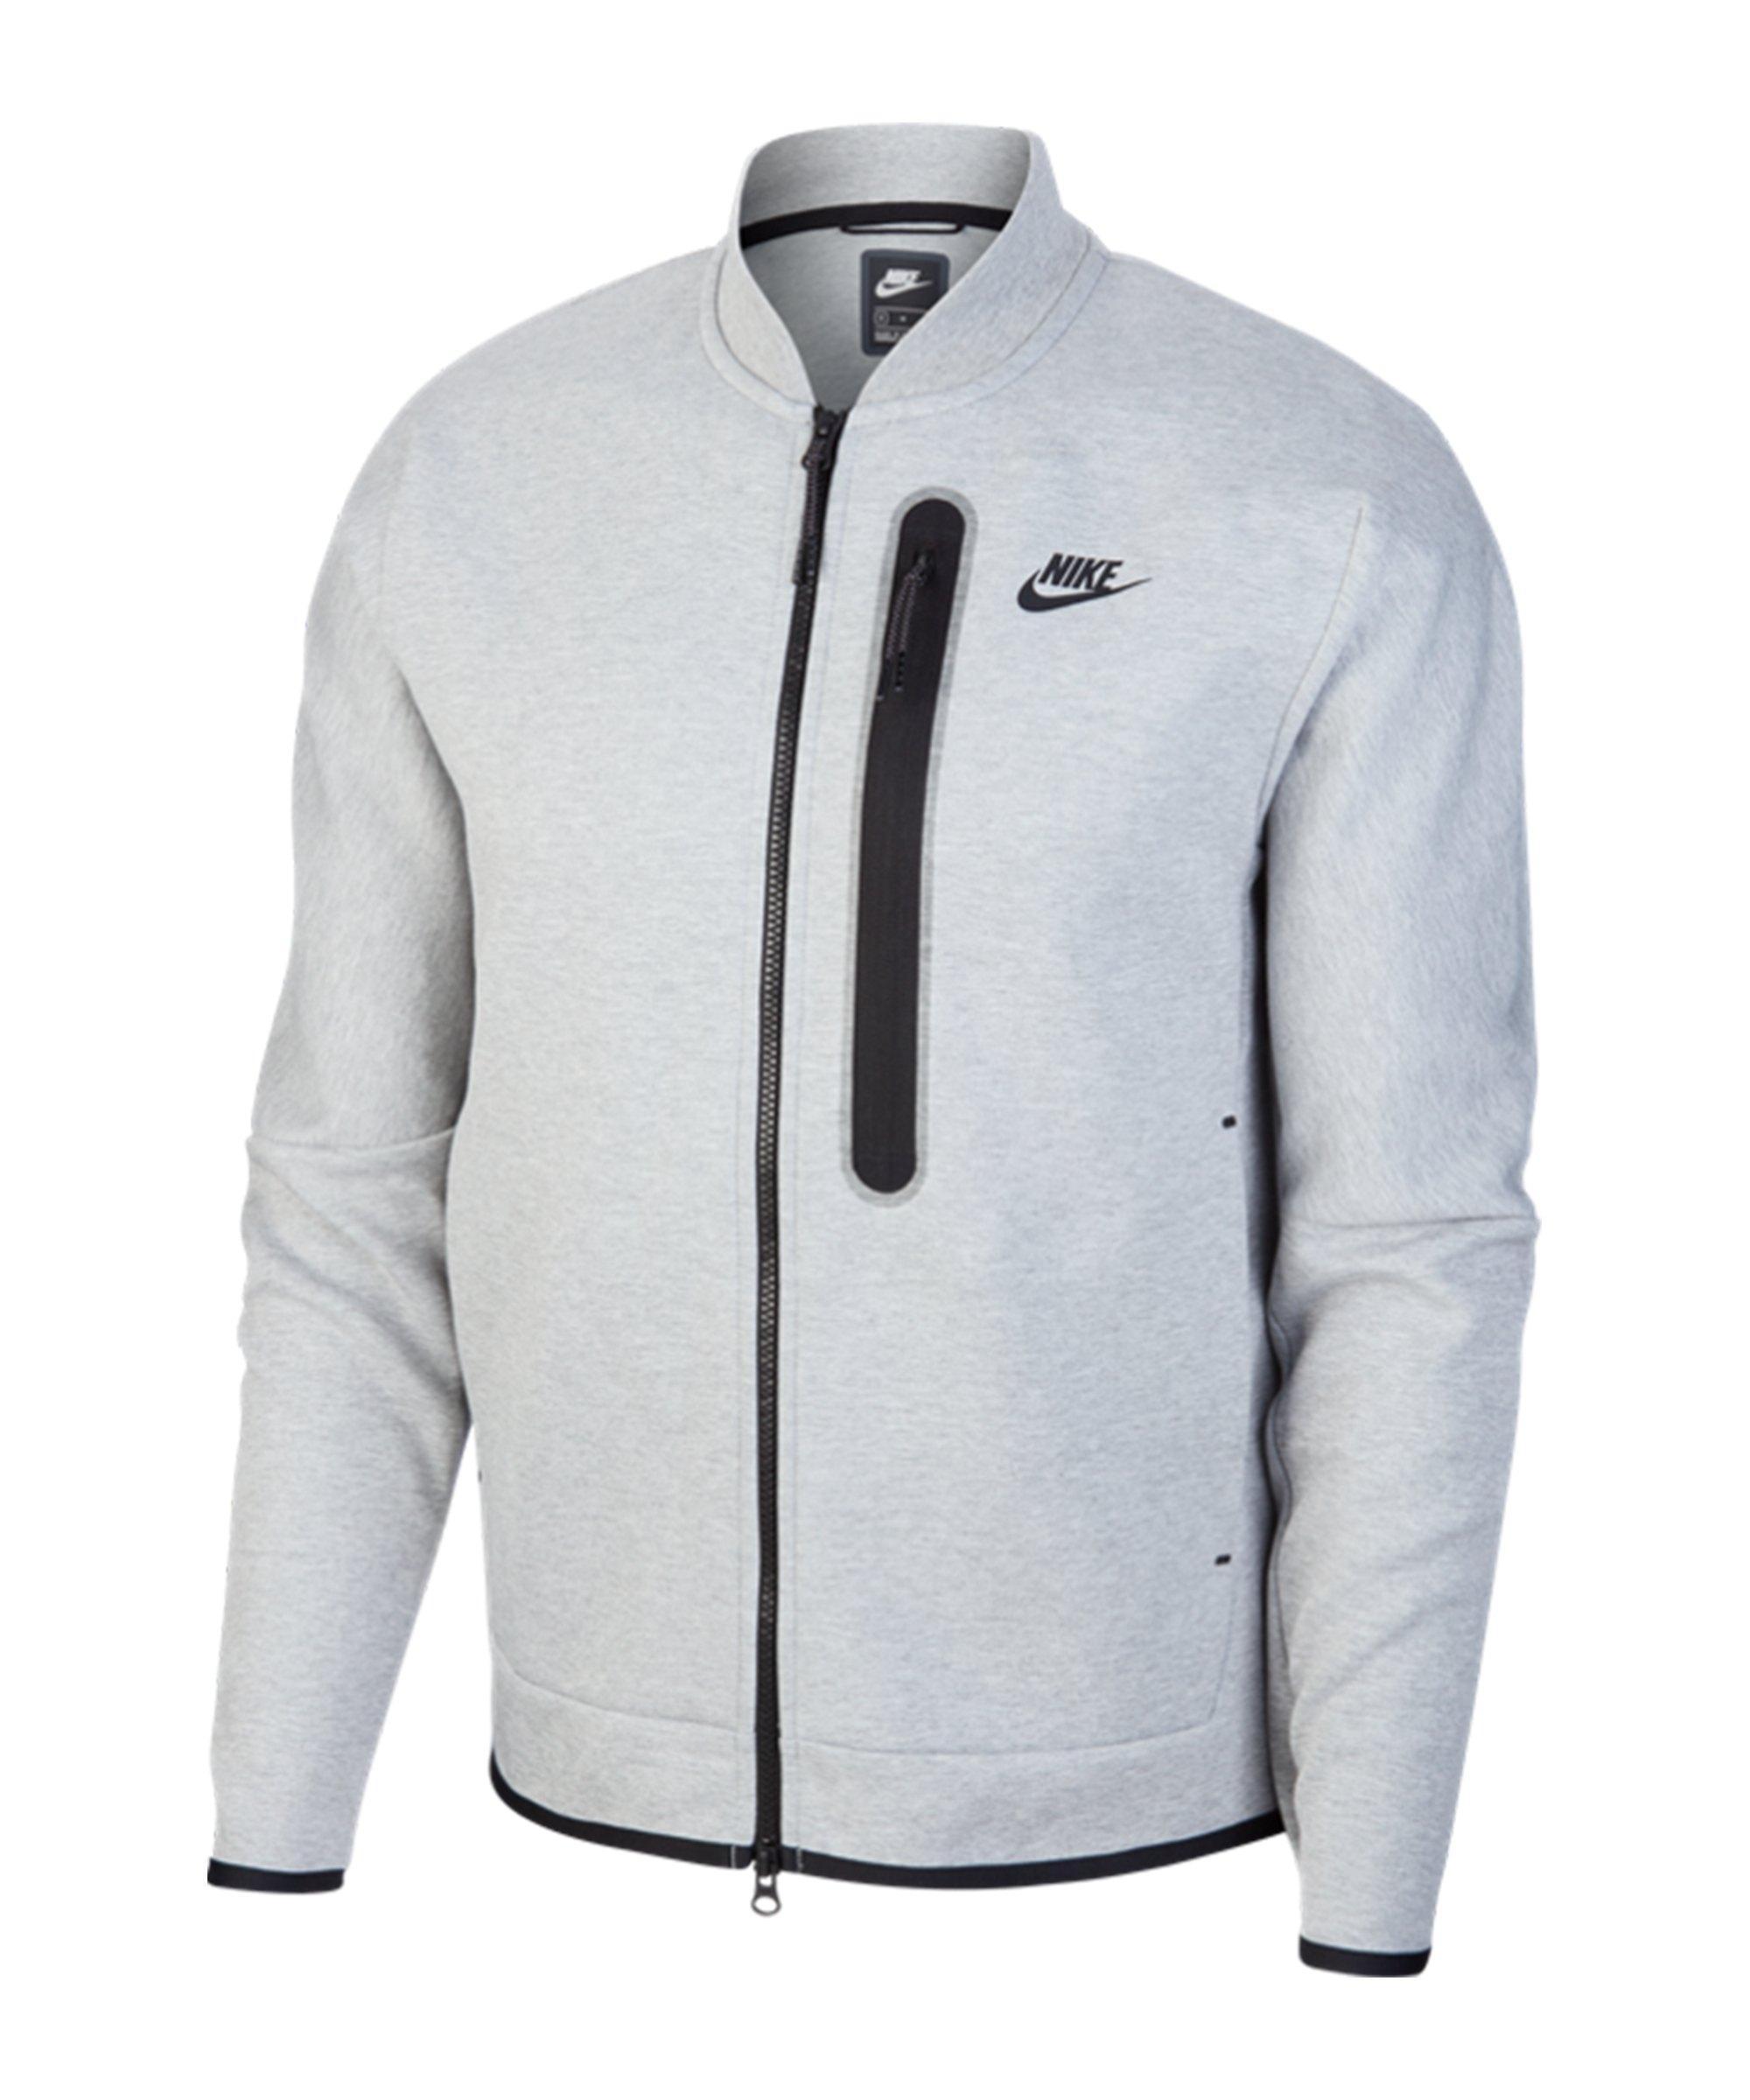 Nike Tech Fleece Bomber Jacker Grau F063 - grau